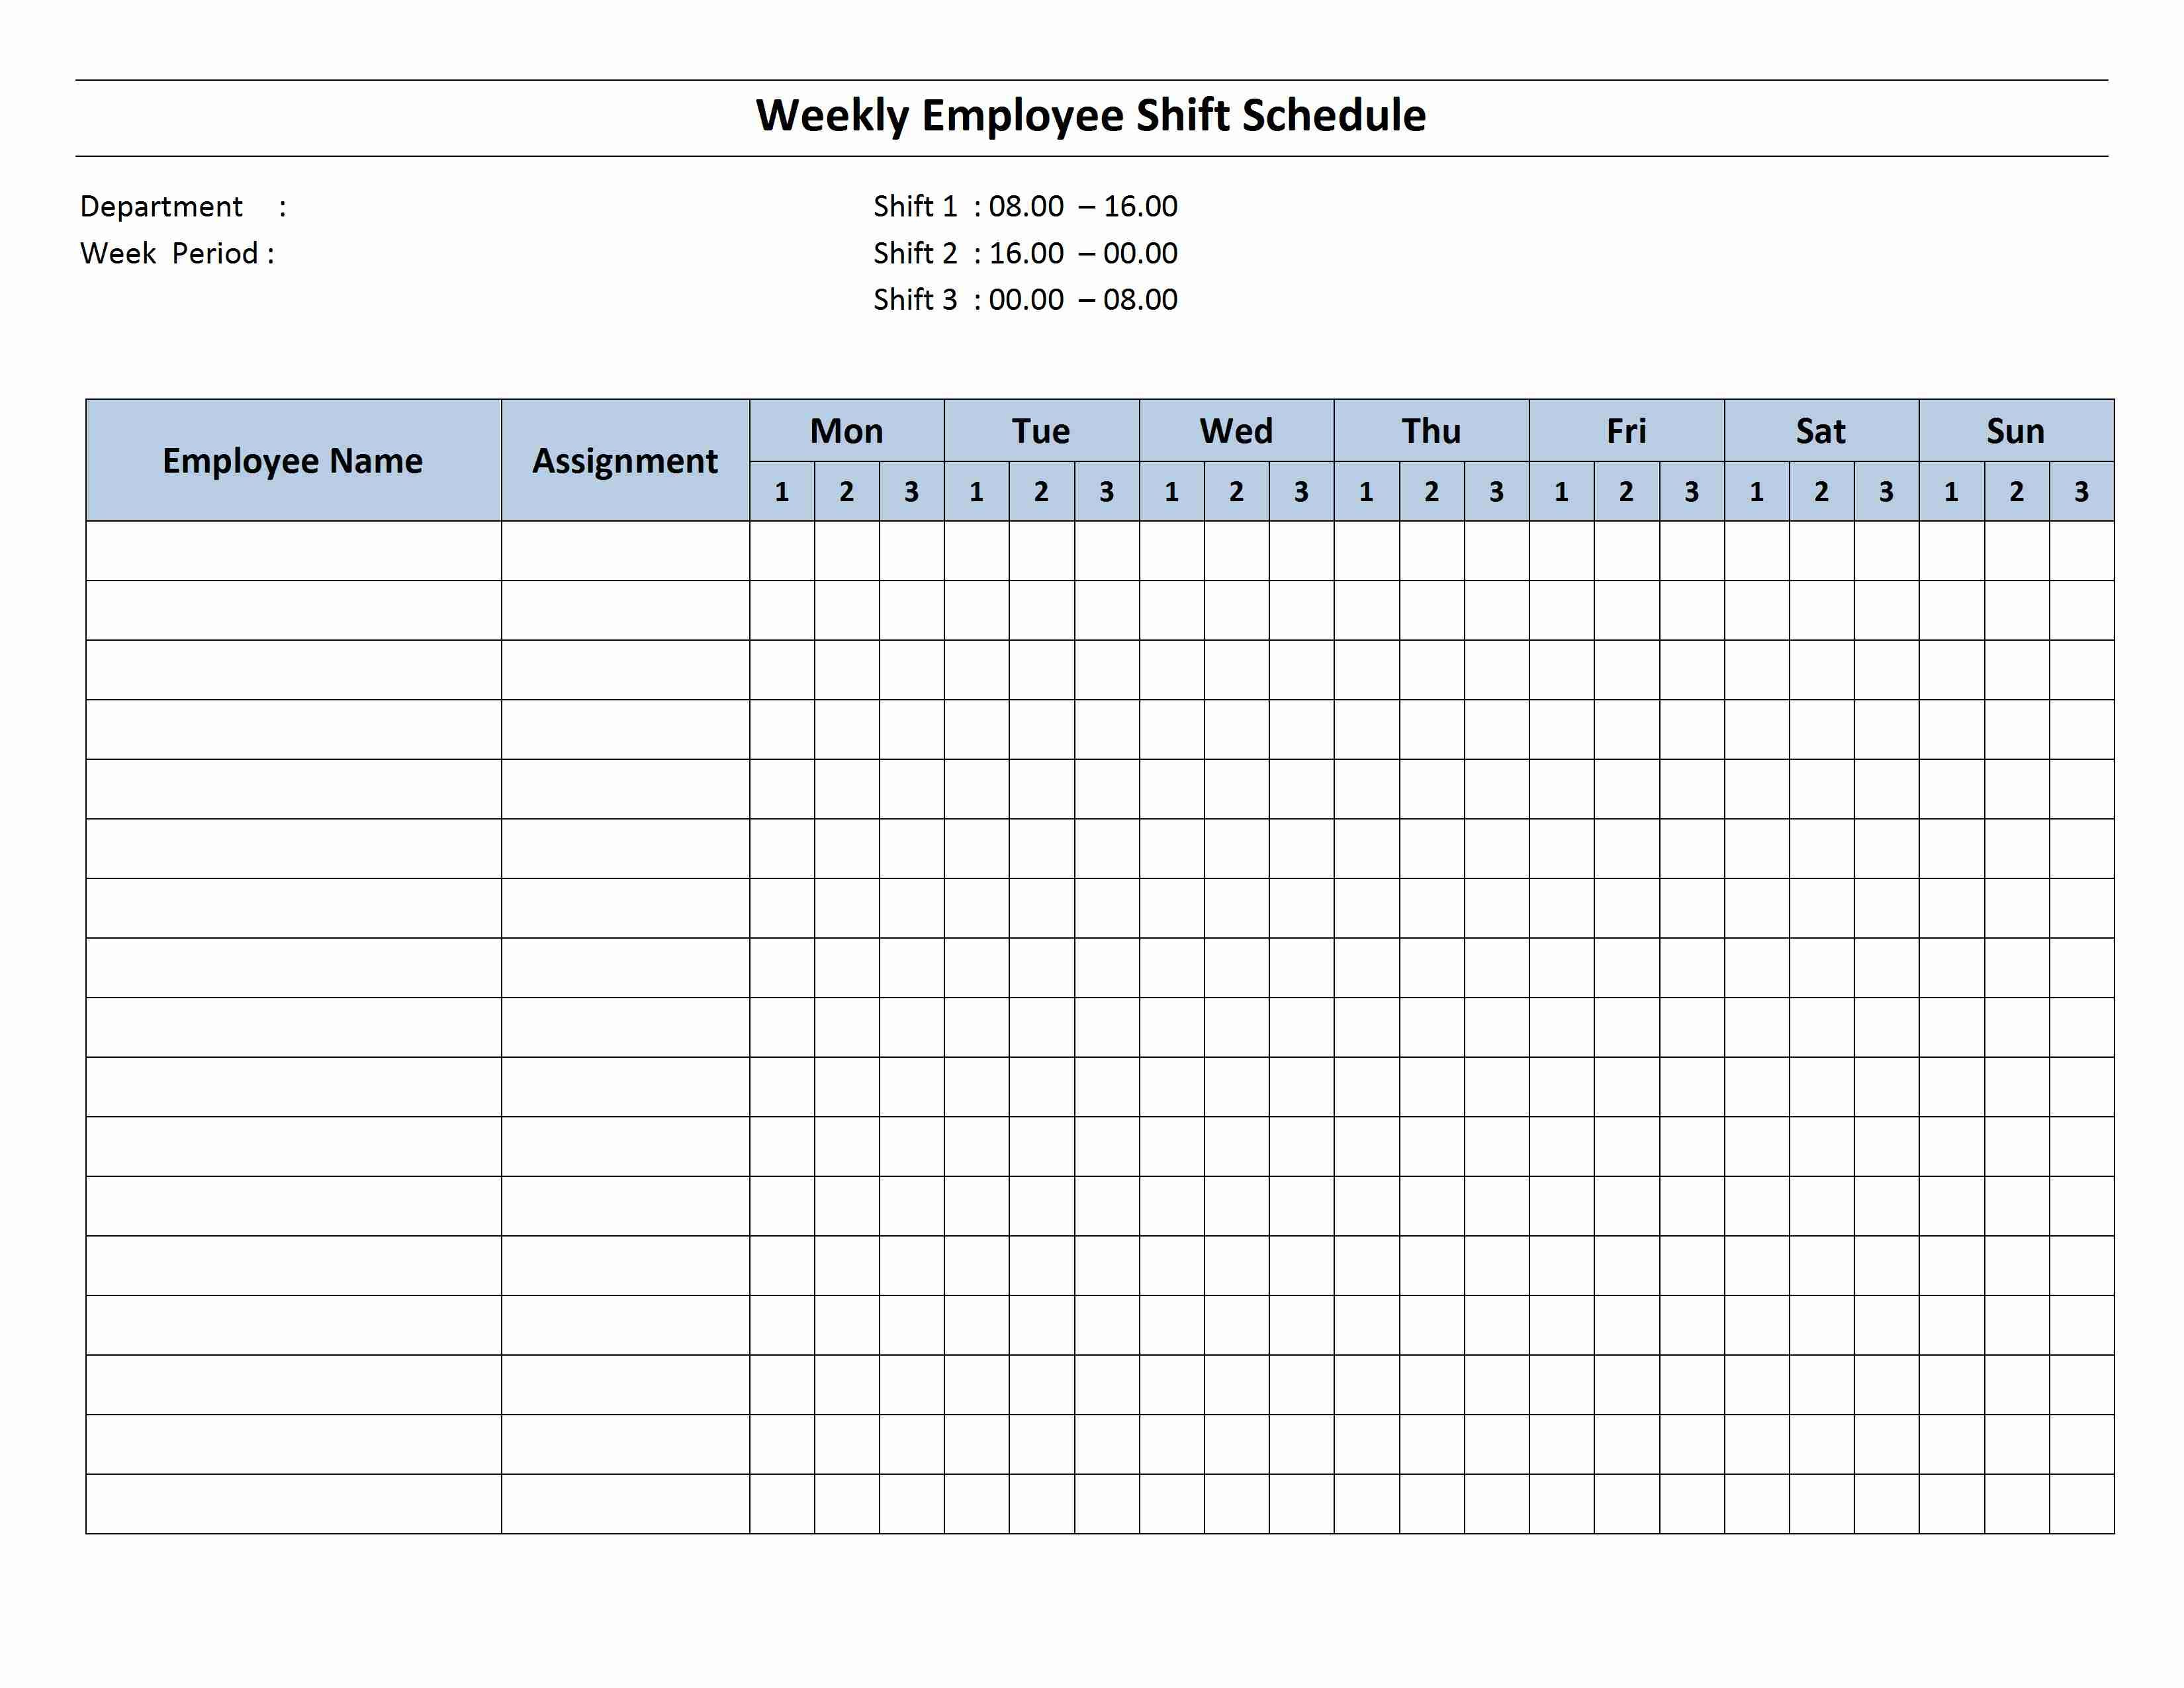 Free Monthly Work Schedule Template   Weekly Employee 8 Hour Shift - Free Printable Weekly Work Schedule